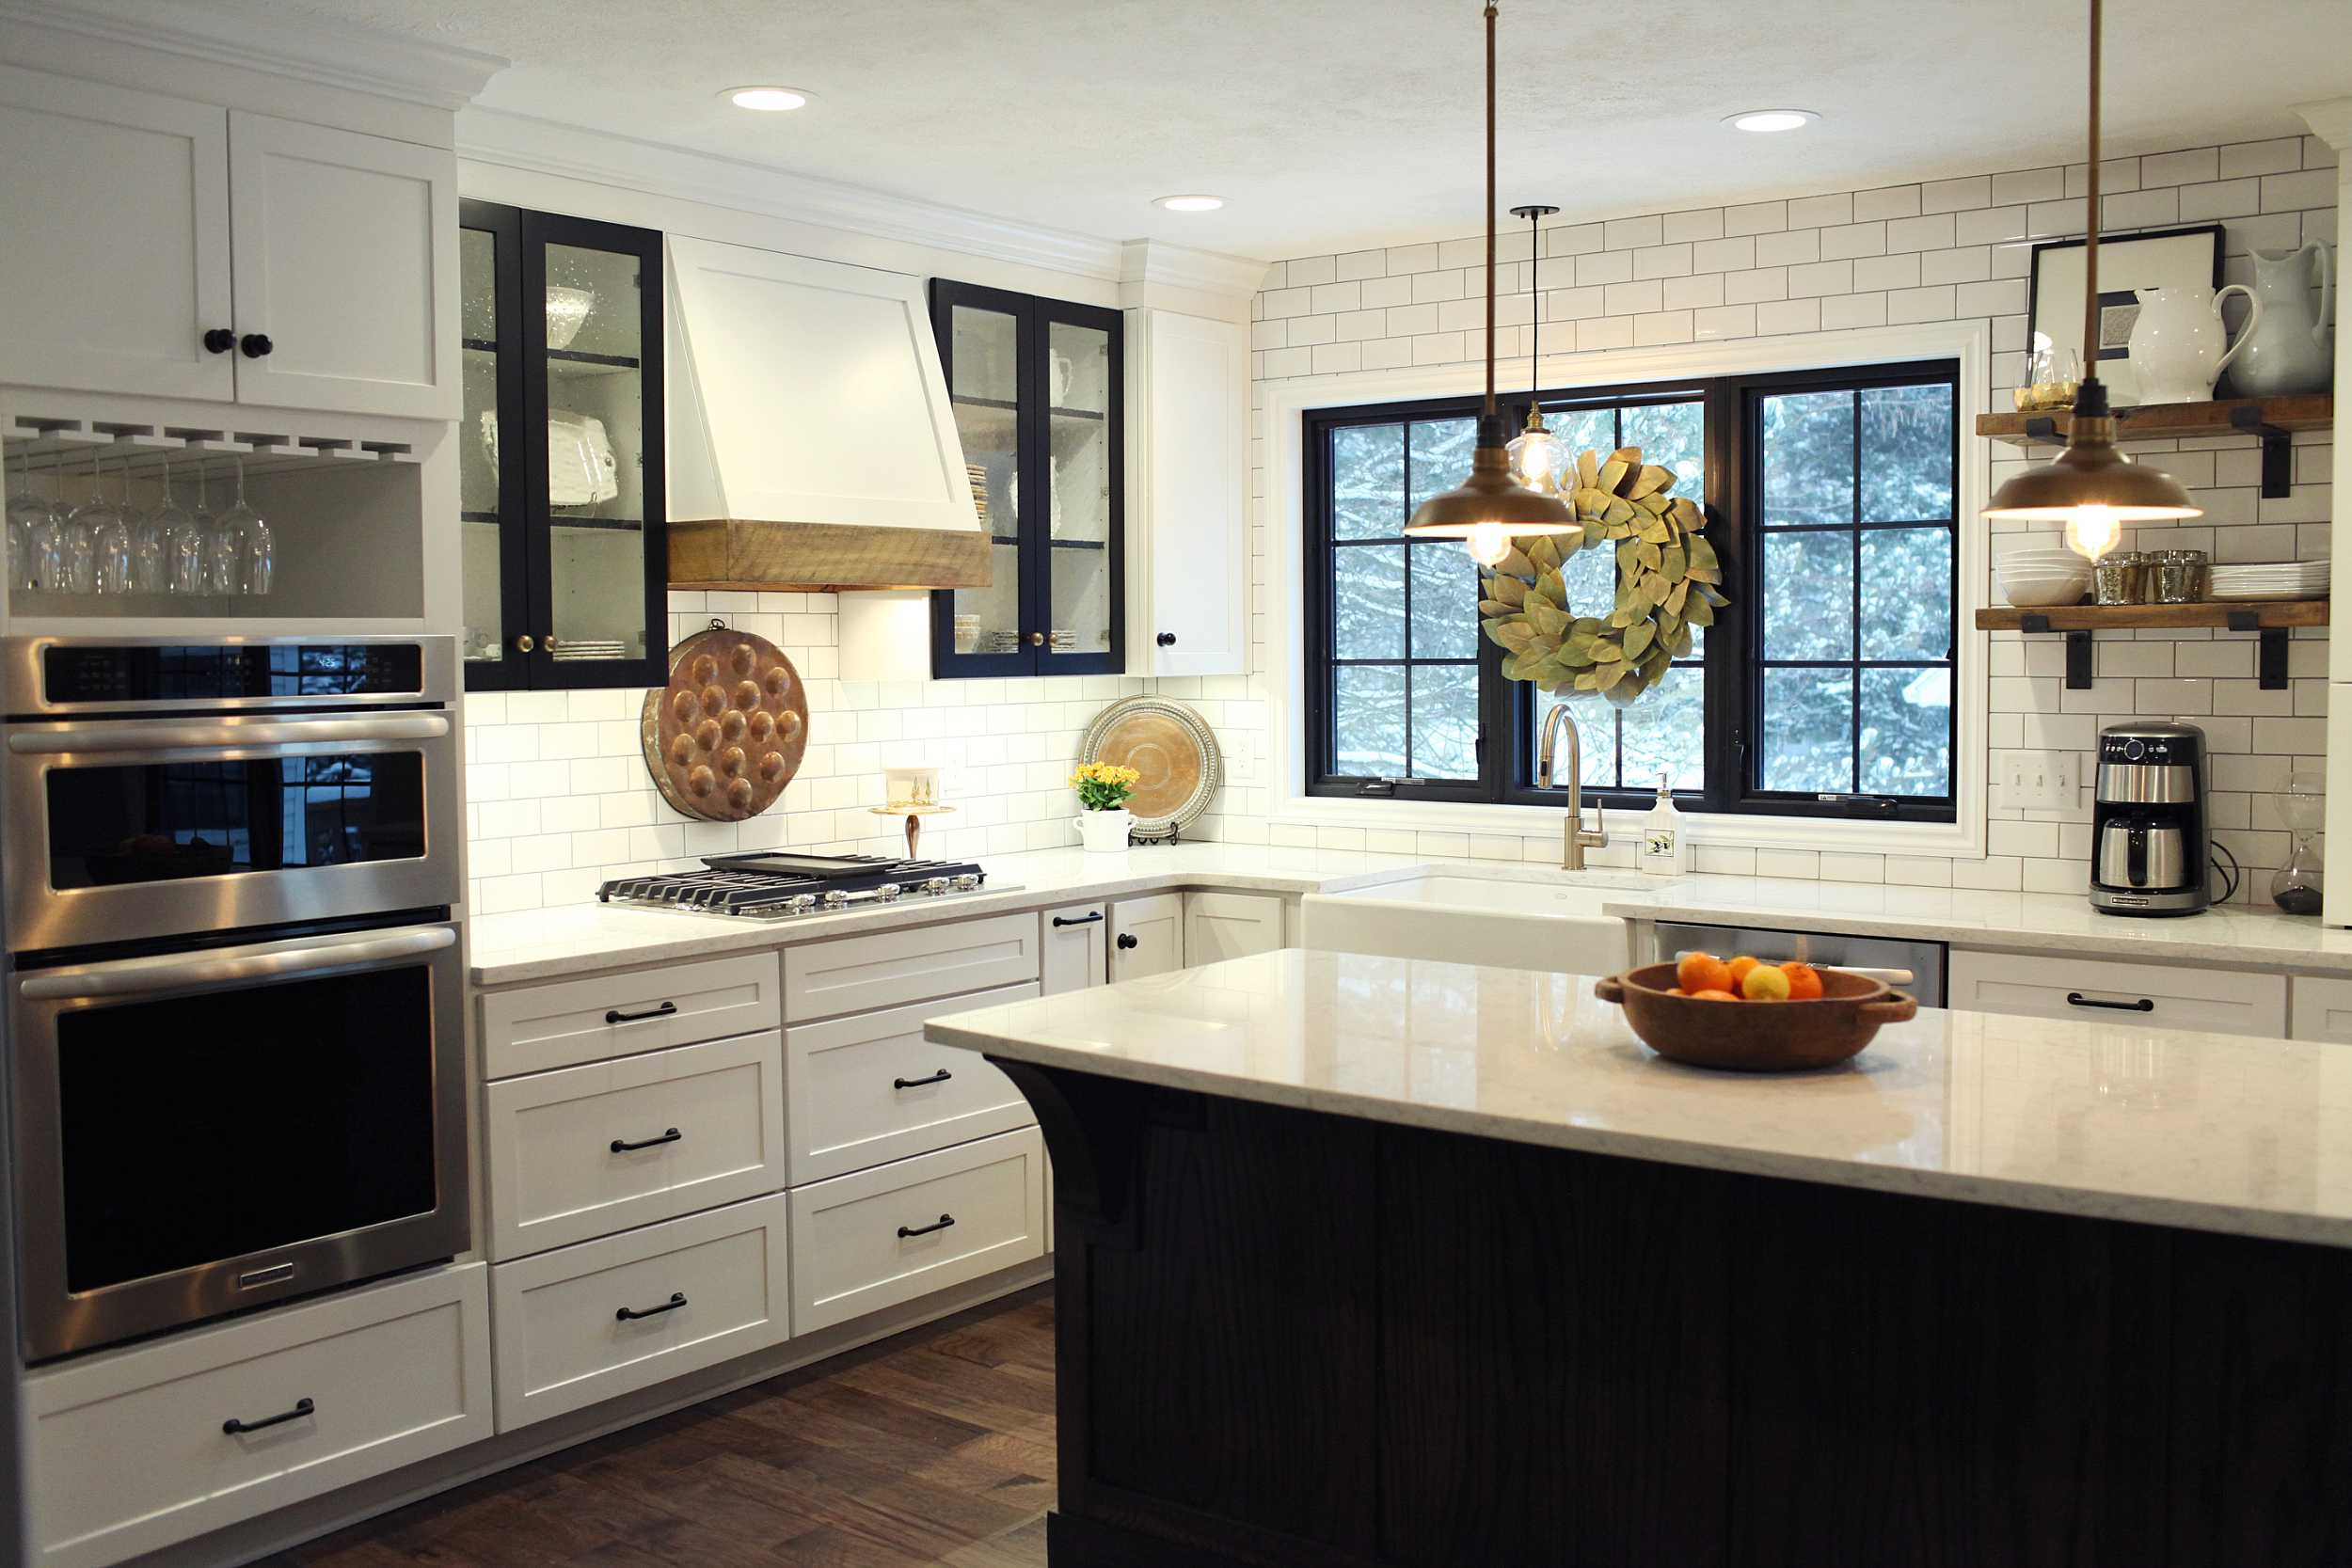 kitchen_remodel (1).jpg